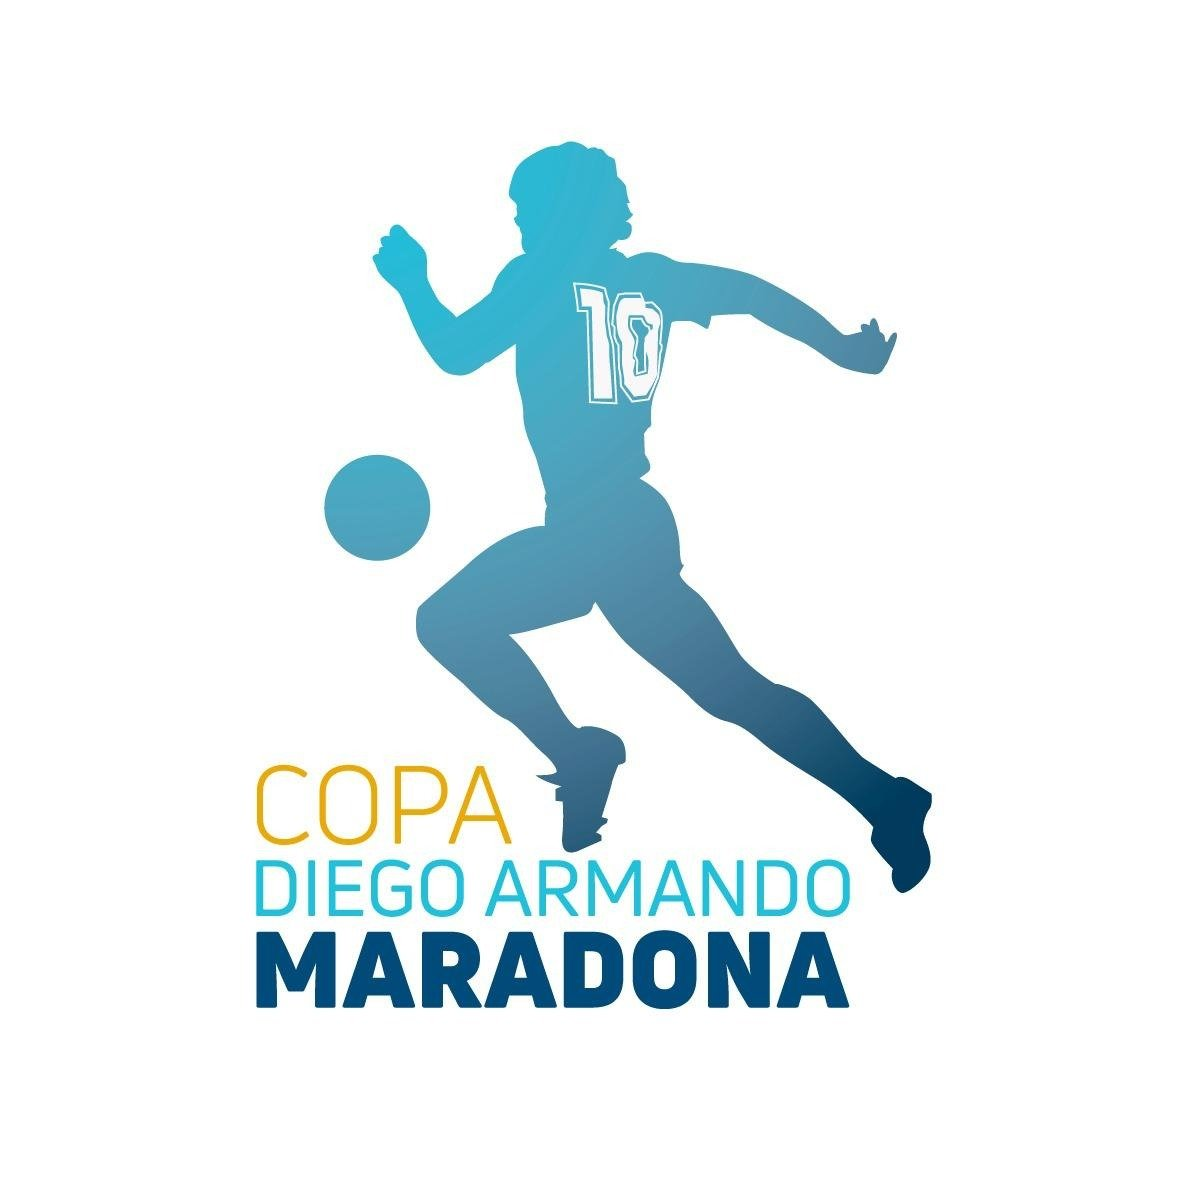 Resultados de ontem:  #CopaDiegoMaradona: Racing 1-0 Unión - ⚽C. Alcaraz  Colón 1-2 Independiente - ⚽B. Fernández; J. Menéndez e A. Velasco  Vélez Sarsfield 0-1 GyELP - ⚽M. Coronel  Godoy Cruz 0-0 Banfield  Rosario Central 0-2 River Plate - ⚽R. Rojas e D. Martínez (contra). https://t.co/wgyqAOx2IY